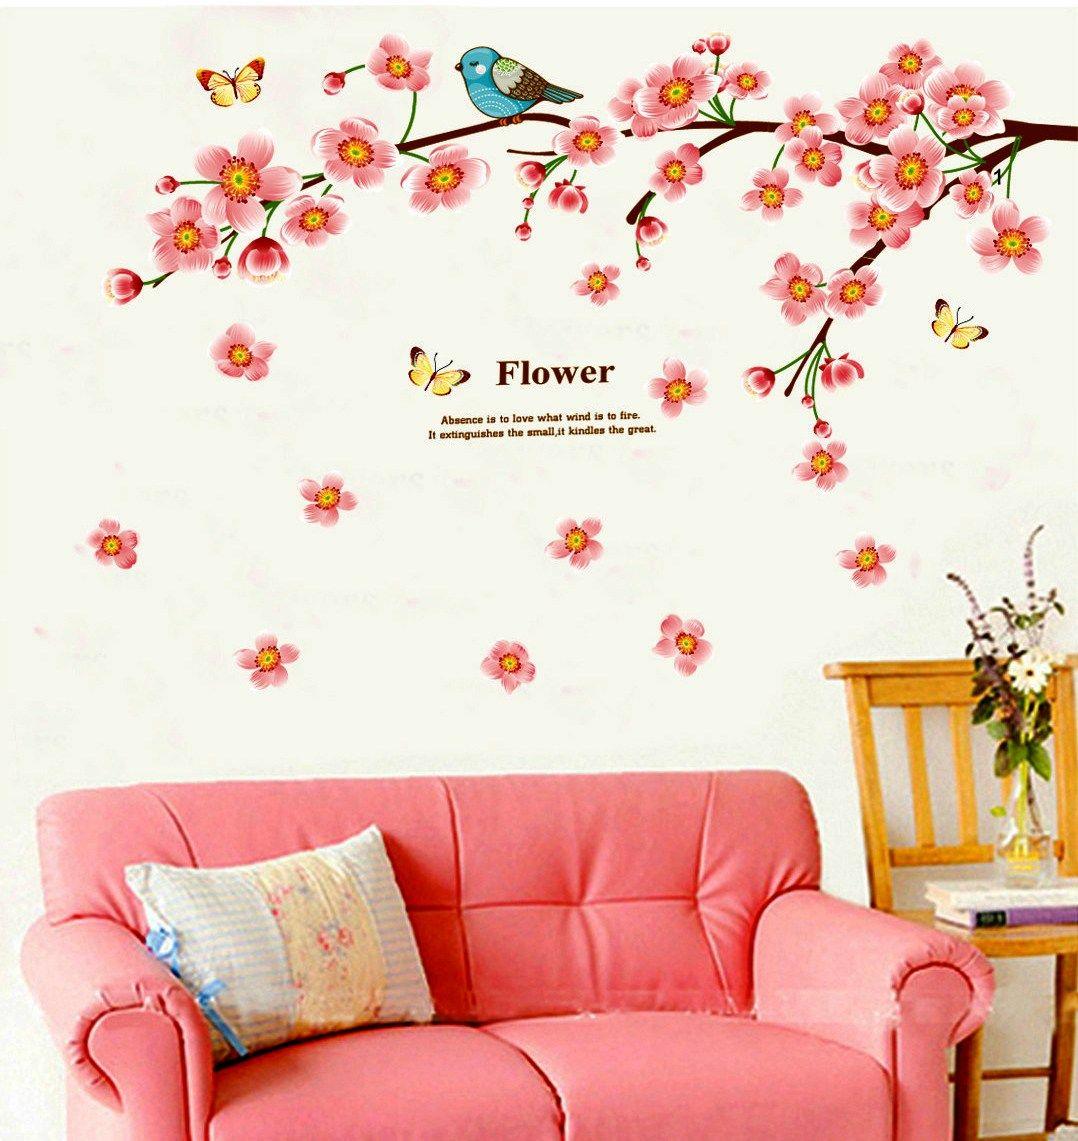 Wall Decor Stickers Peach Flower Wall Stickers Jm7296 Wall